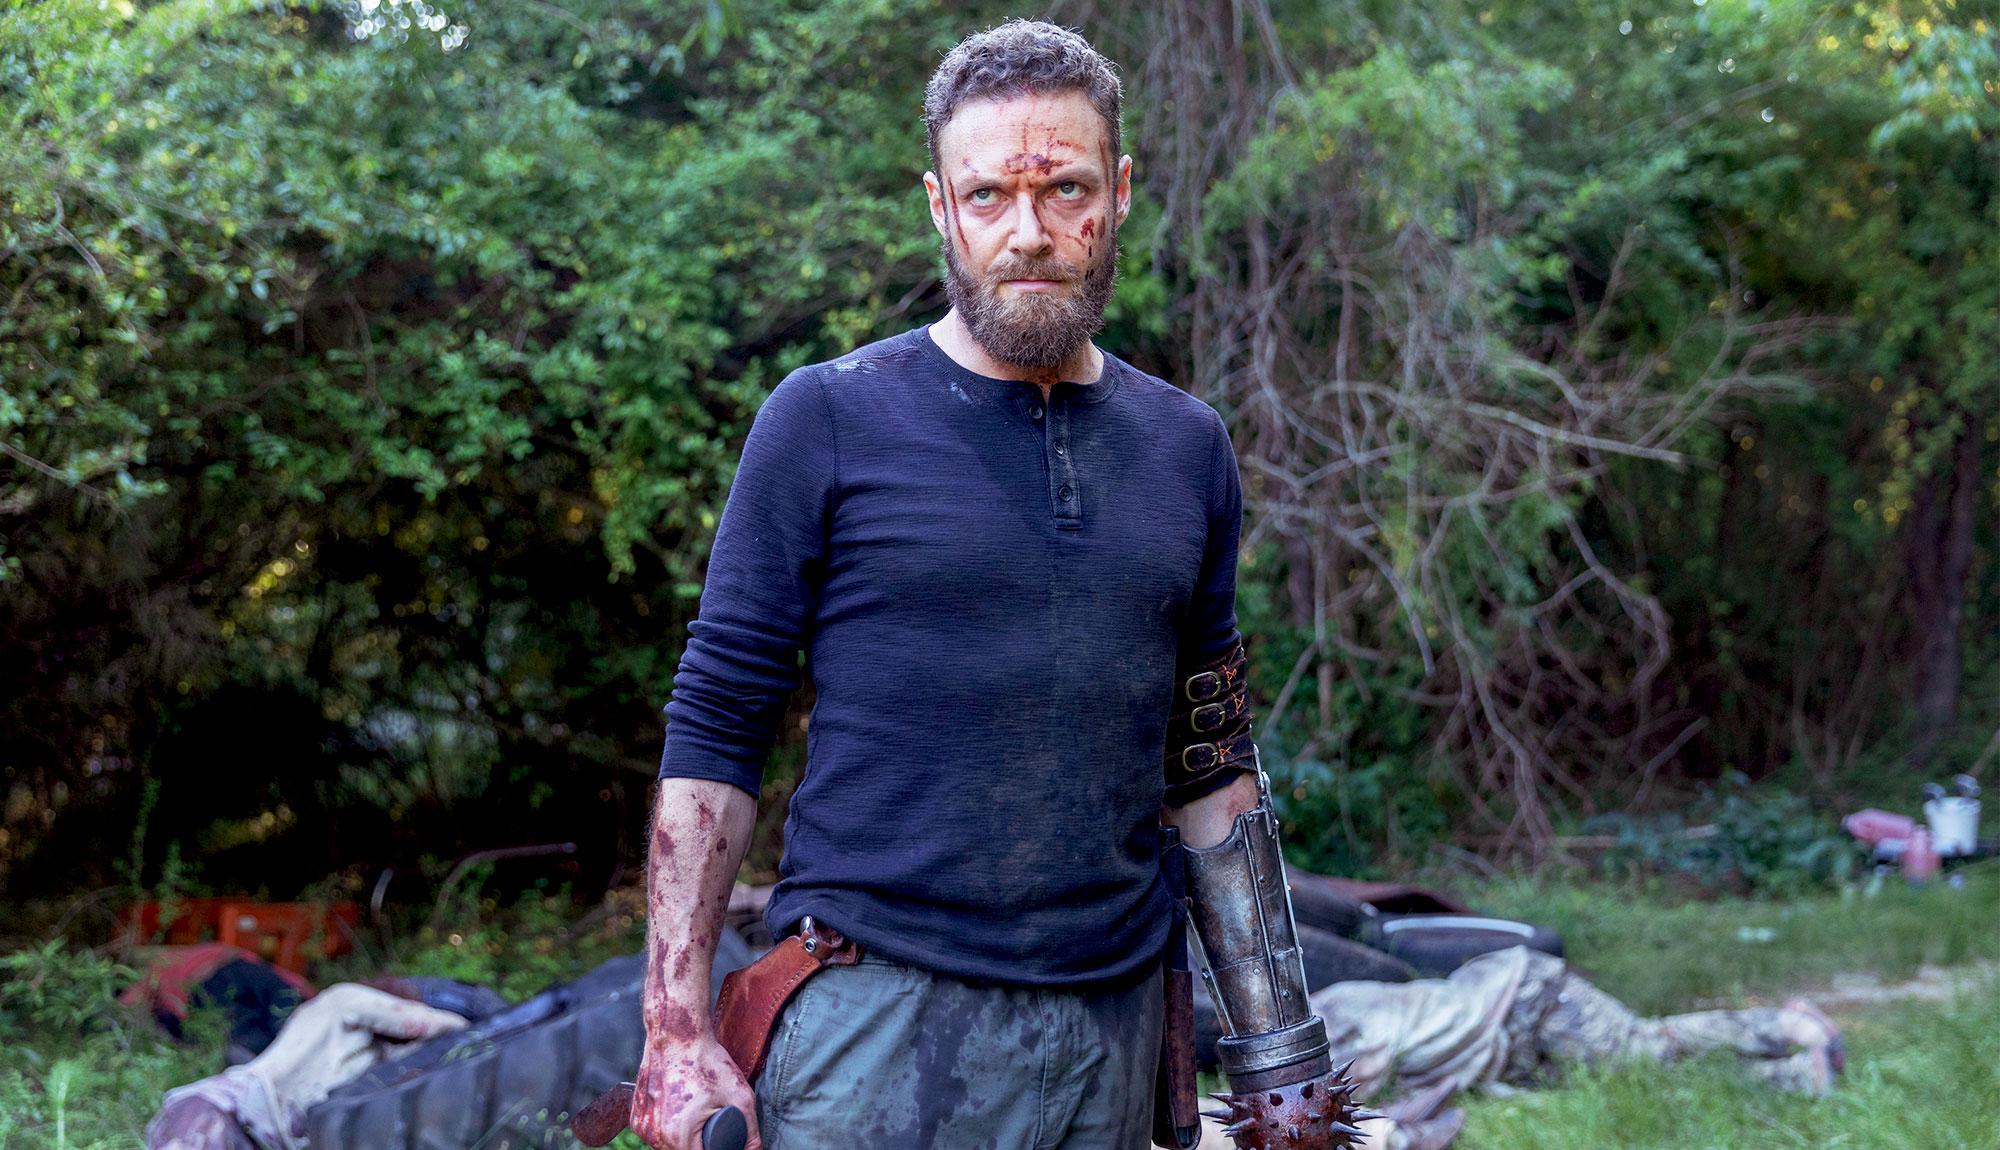 Waves of Walker Hordes Arrive in The Opening Minutes of The Walking Dead Episode 1003